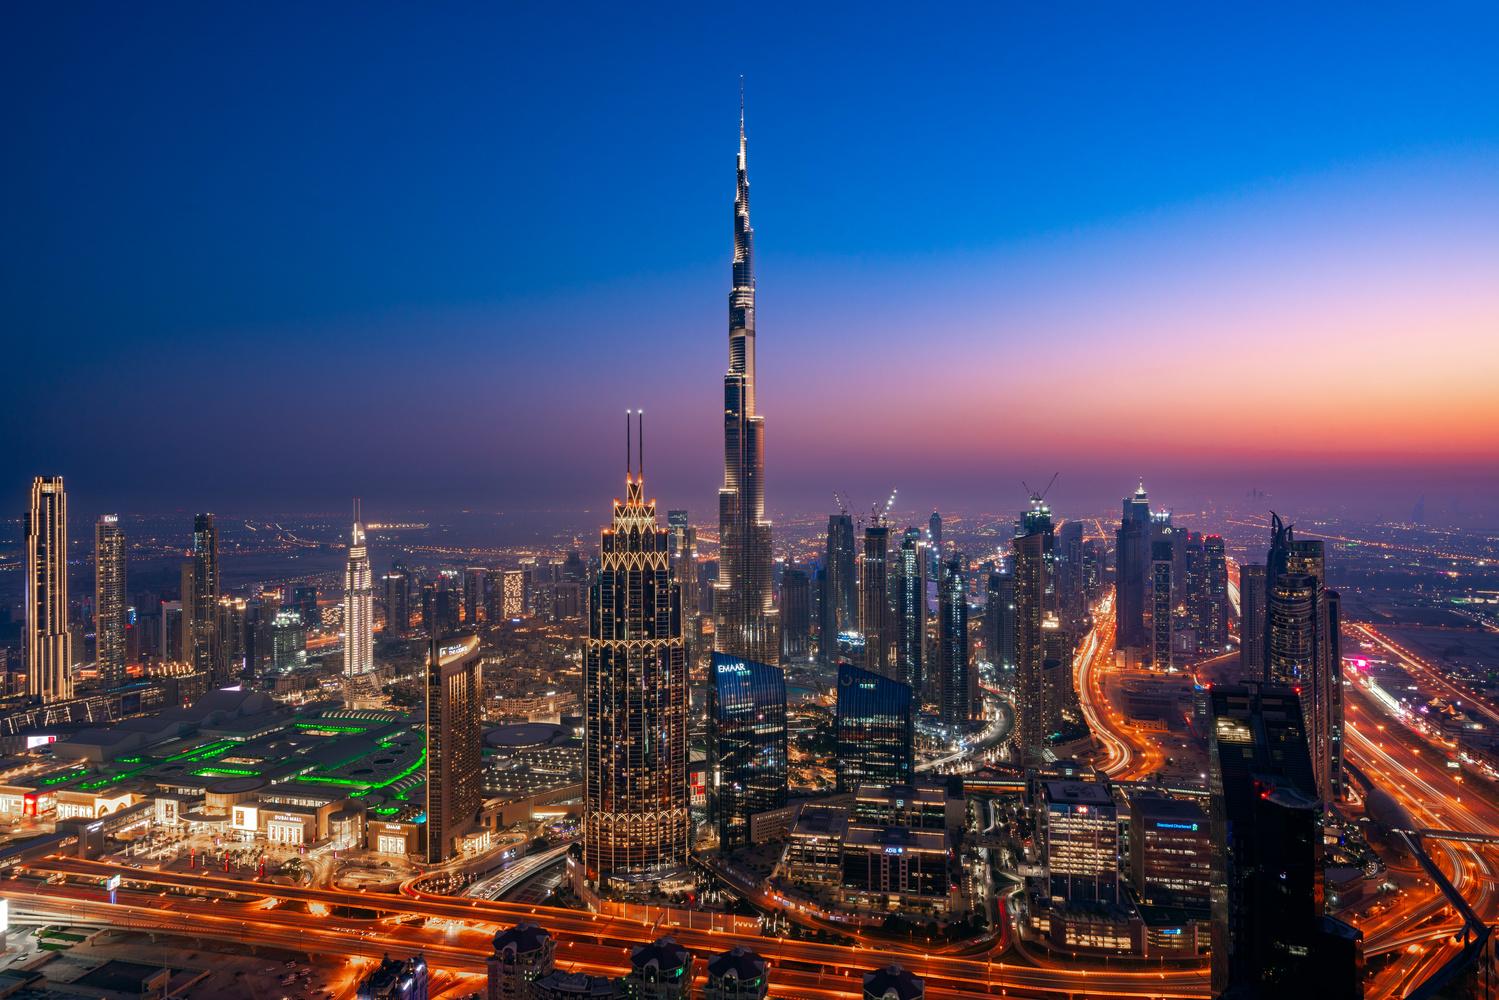 Downtown Dubai at night. by Ben Preece